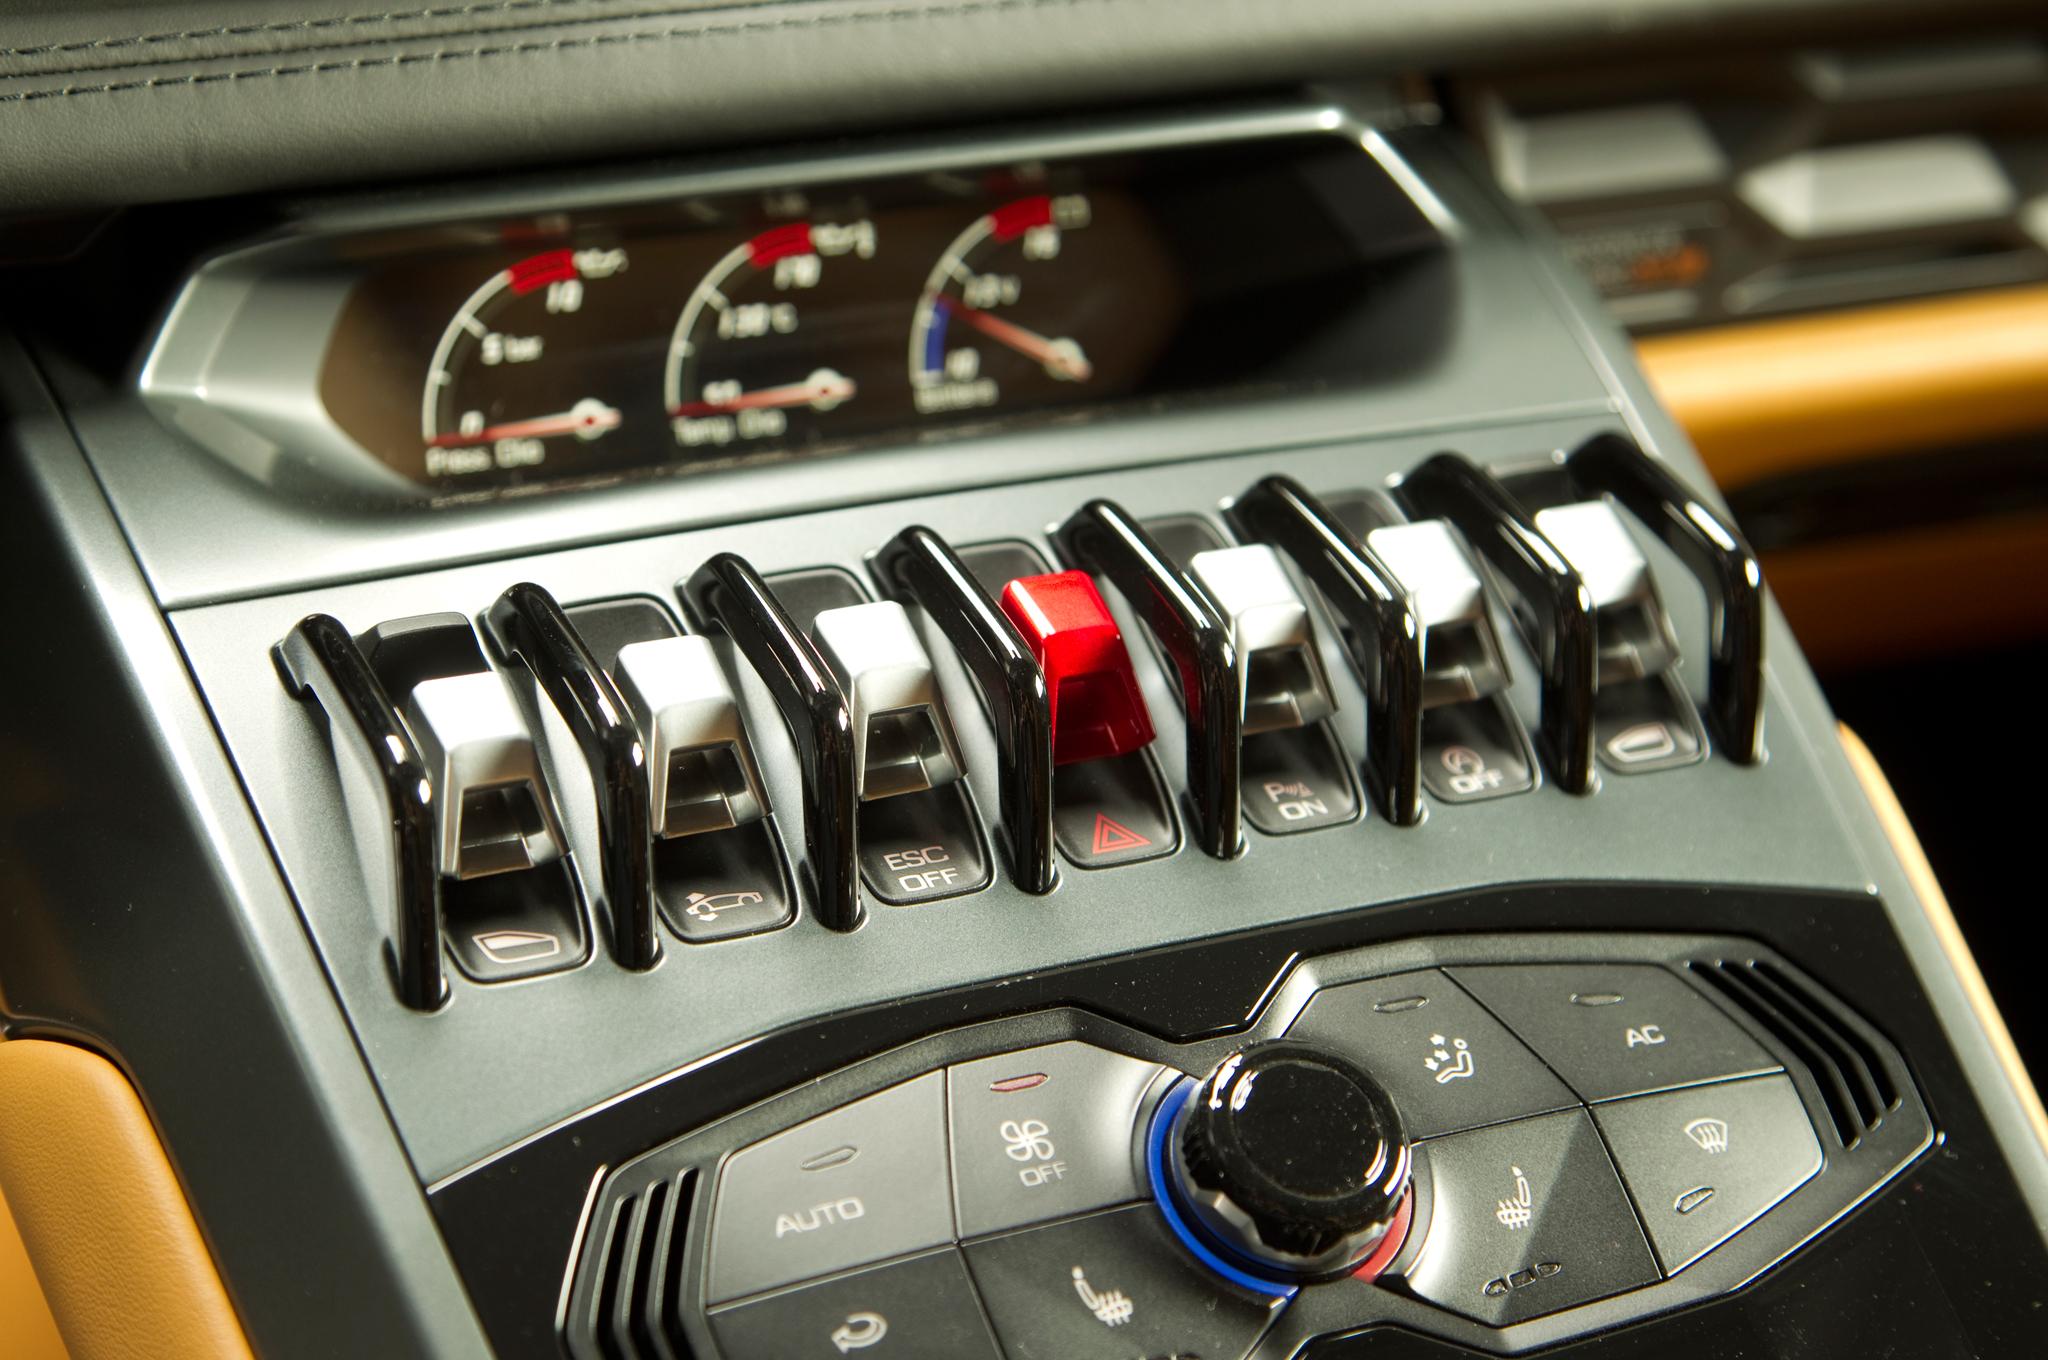 http—image.motortrend.com-f-roadtests-exotic-1312_2015_lamborghini_huracan_first_look-59412209-2015-Lamborghini-Huracan-toggle-switches